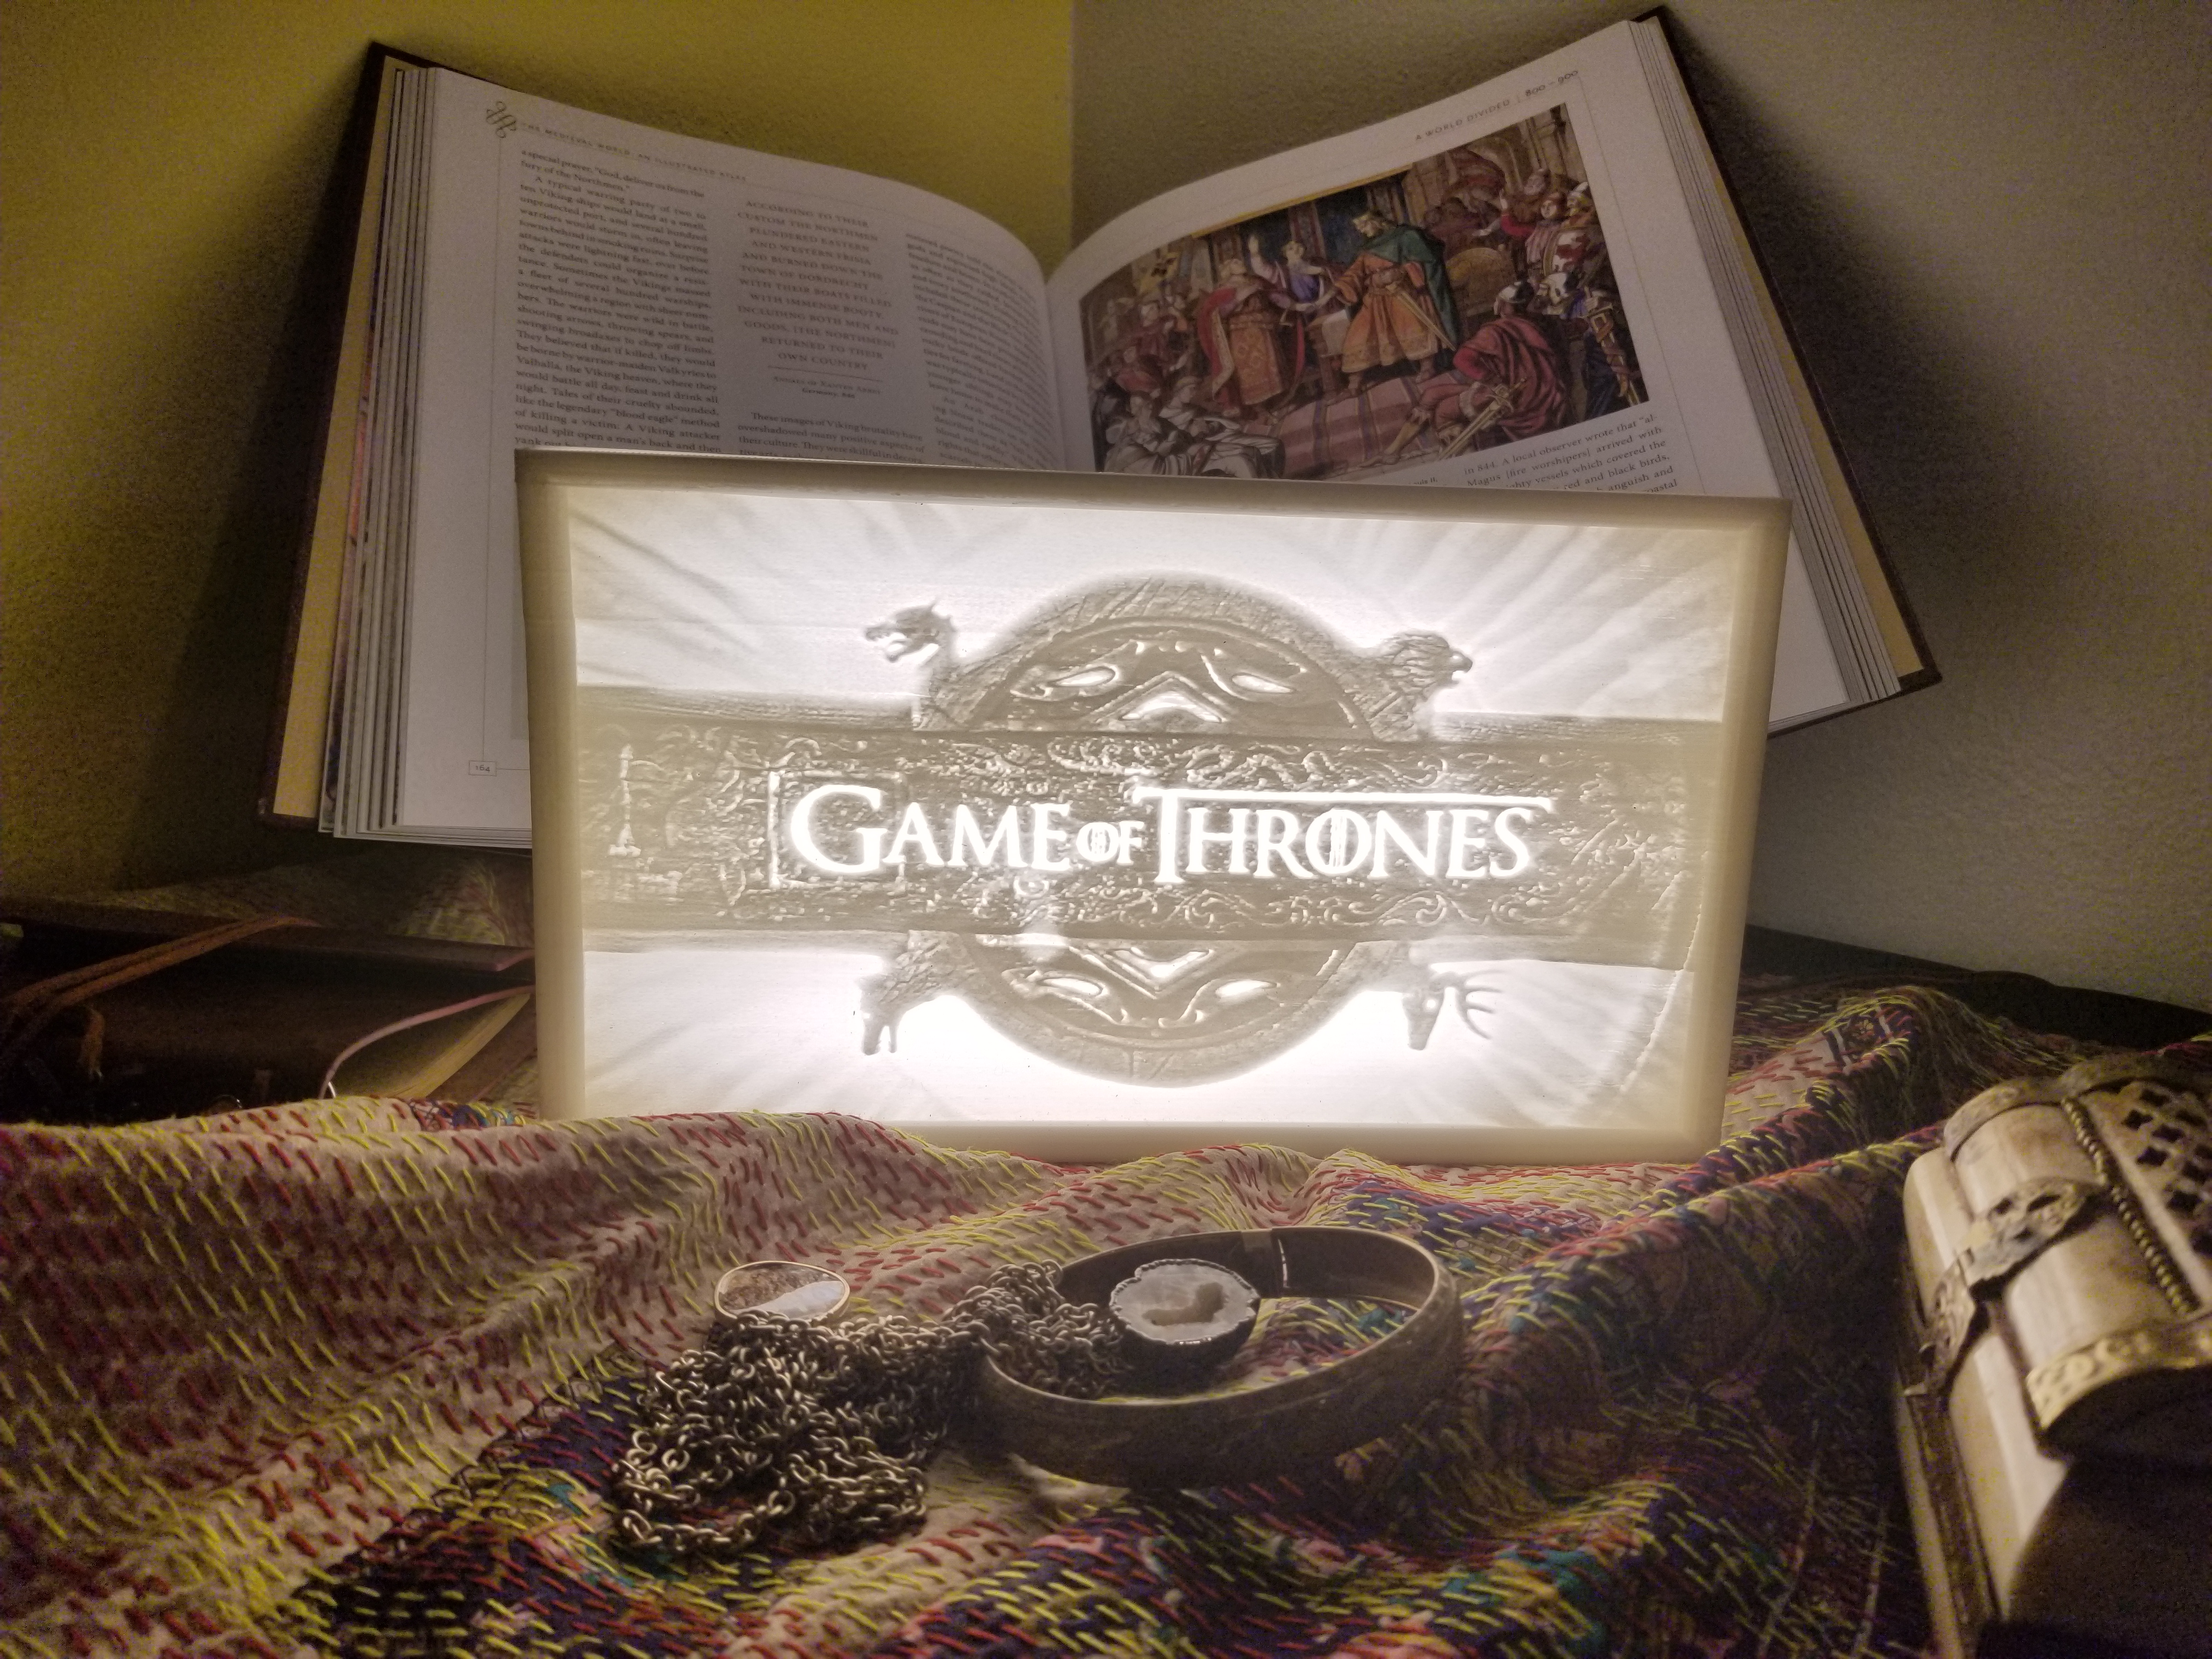 Game of Thrones Lithophane